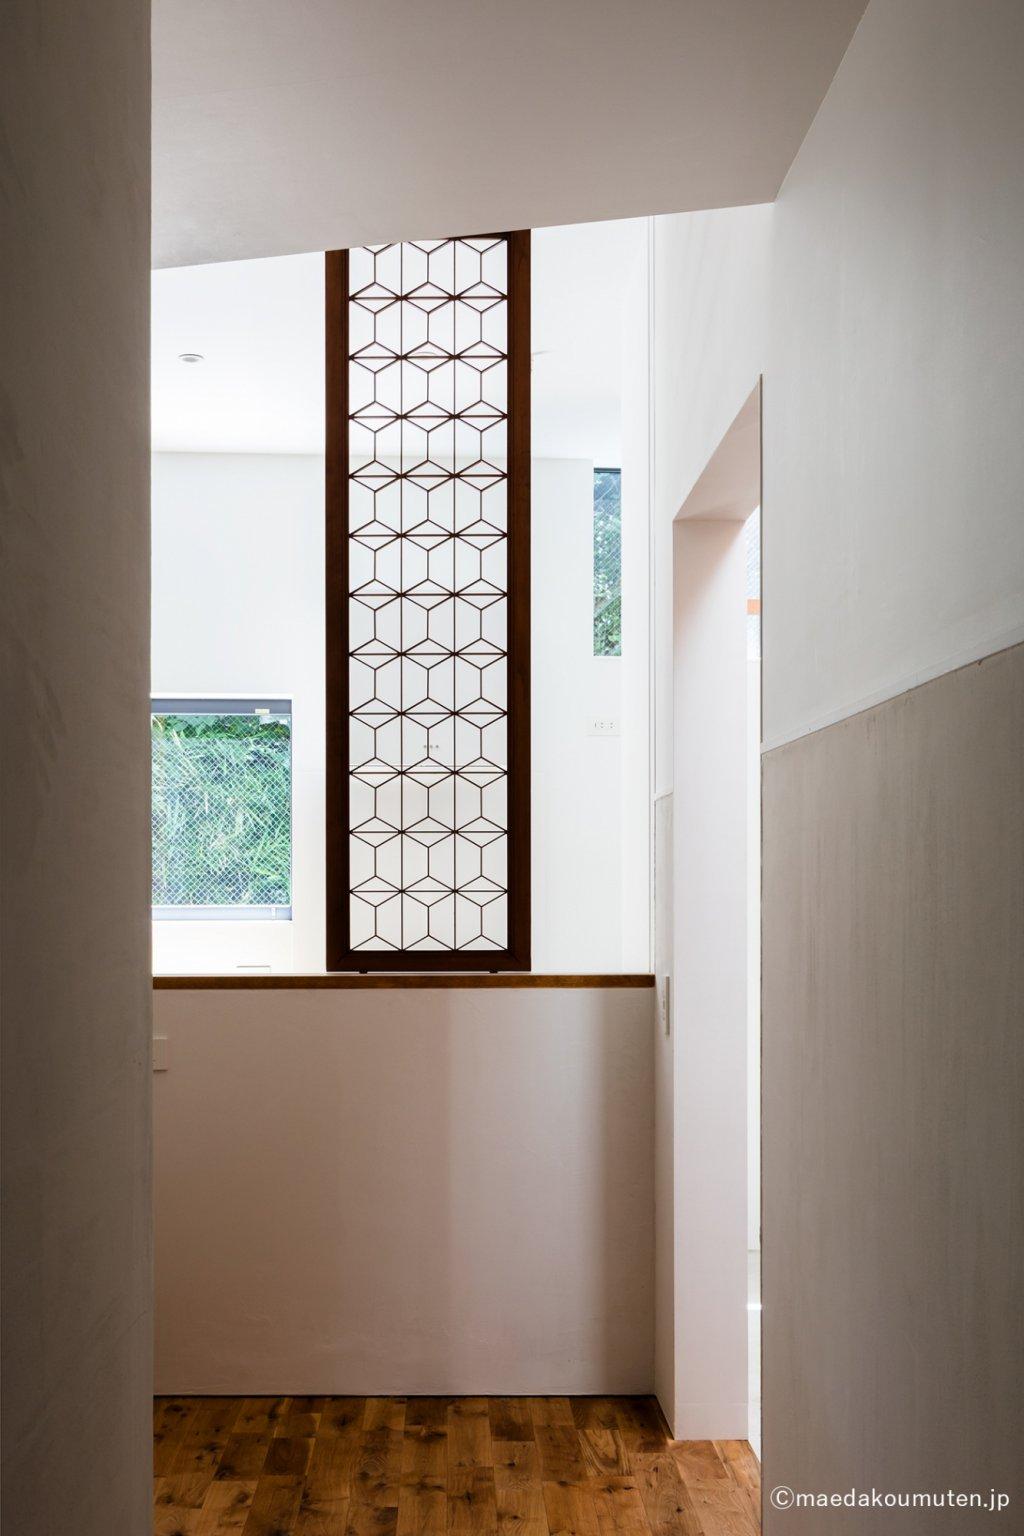 神奈川、工務店、注文住宅、デザイン住宅、建築家、亀井野の家、09